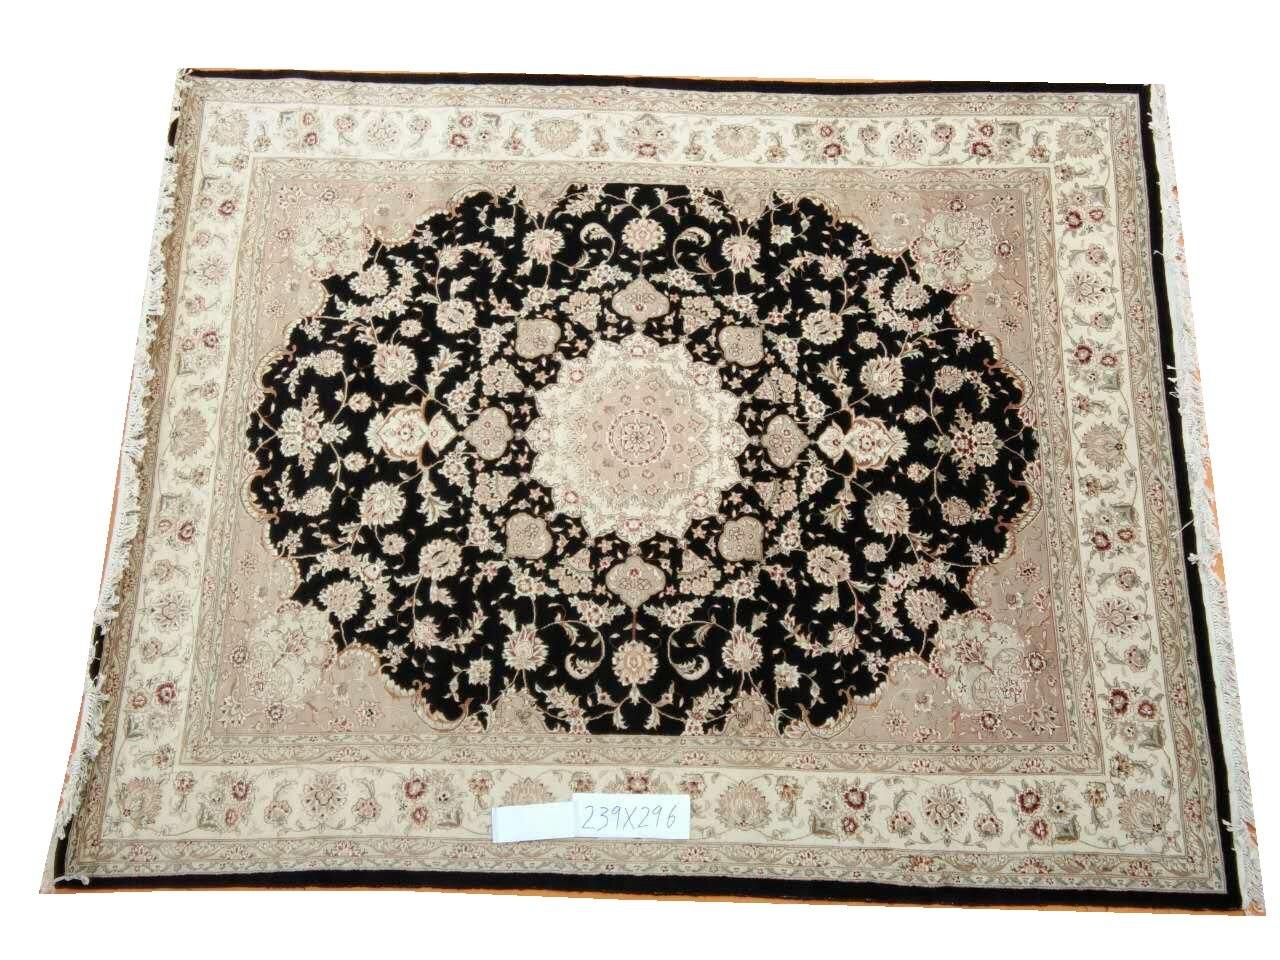 Tapis fait main tapis maison pour salon tapis carré Style persan tapis laine tapis à tricoter